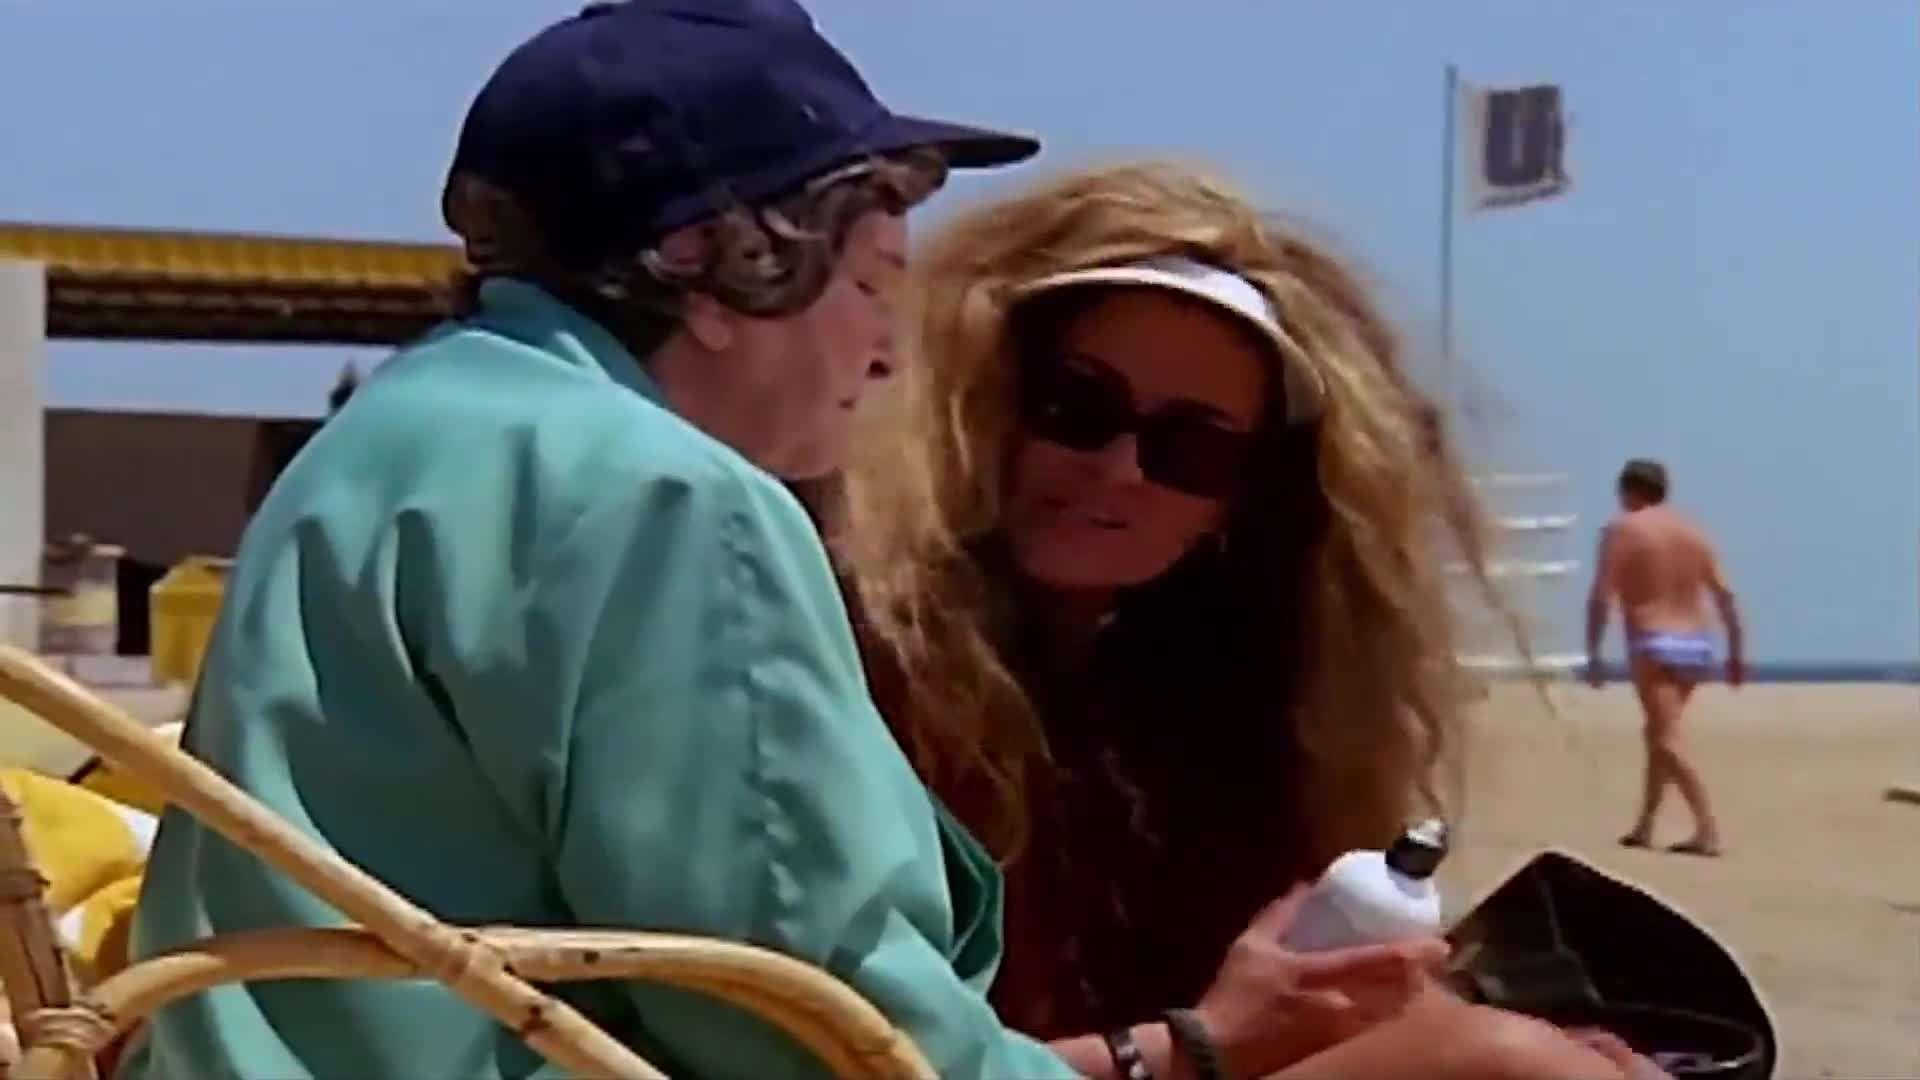 [فيلم][تورنت][تحميل][استاكوزا][1996][1080p][Web-DL] 9 arabp2p.com